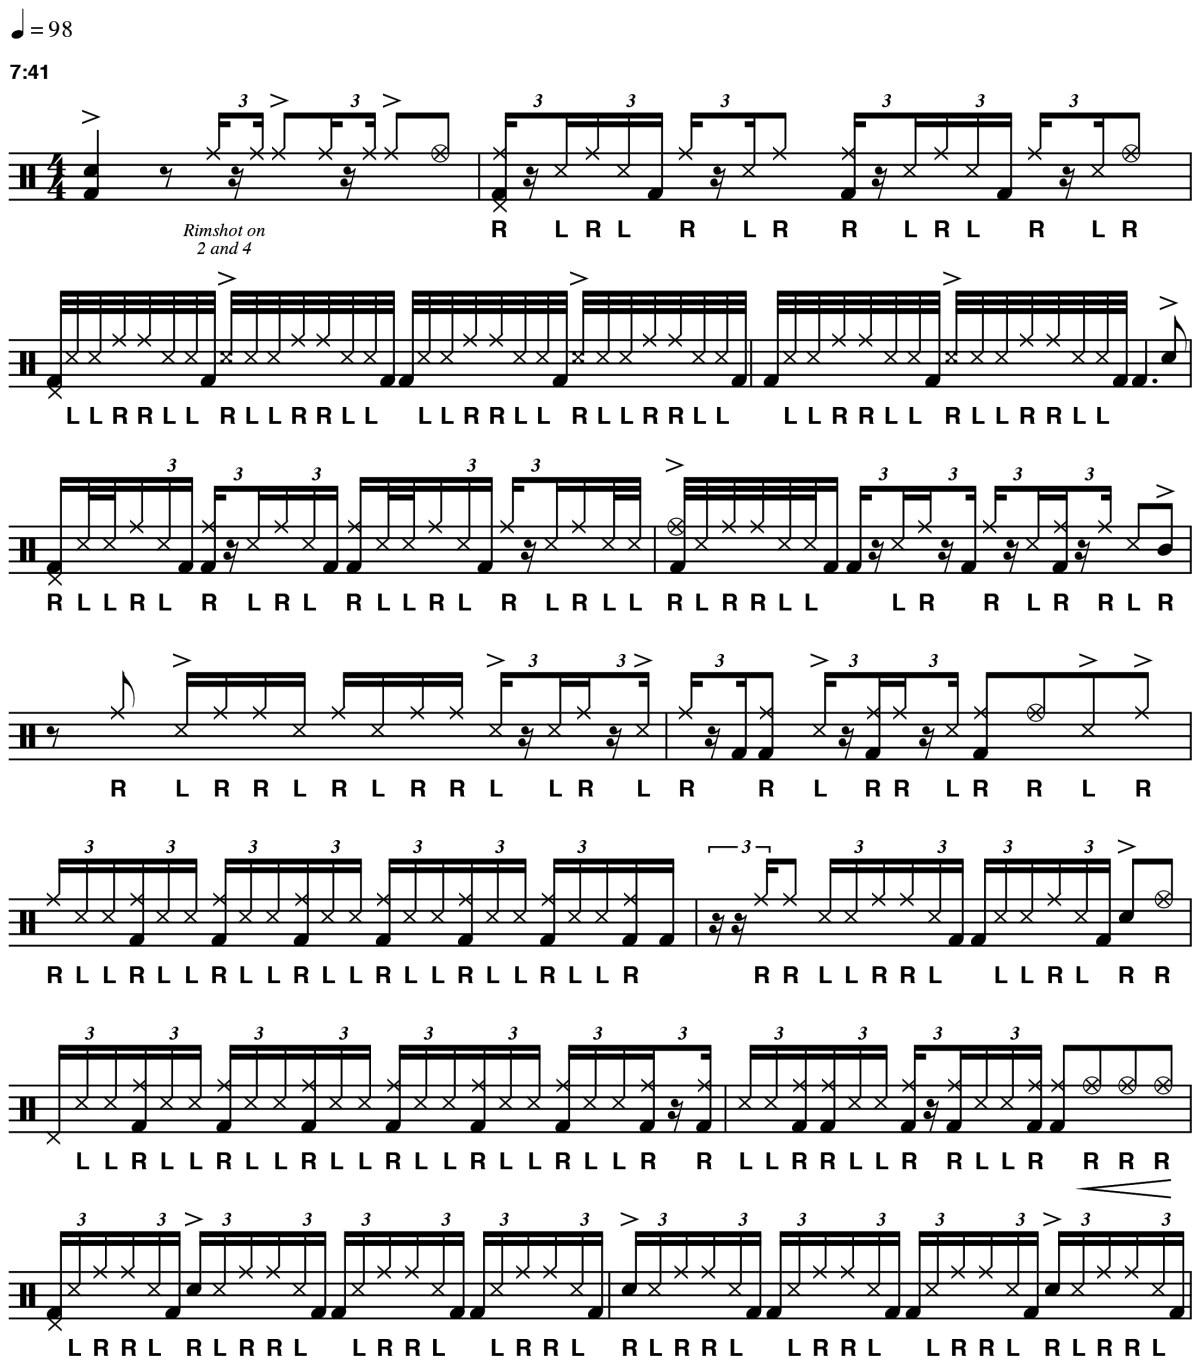 Steve Gadd's 'Way Back Home' Album: Transcription & Analysis